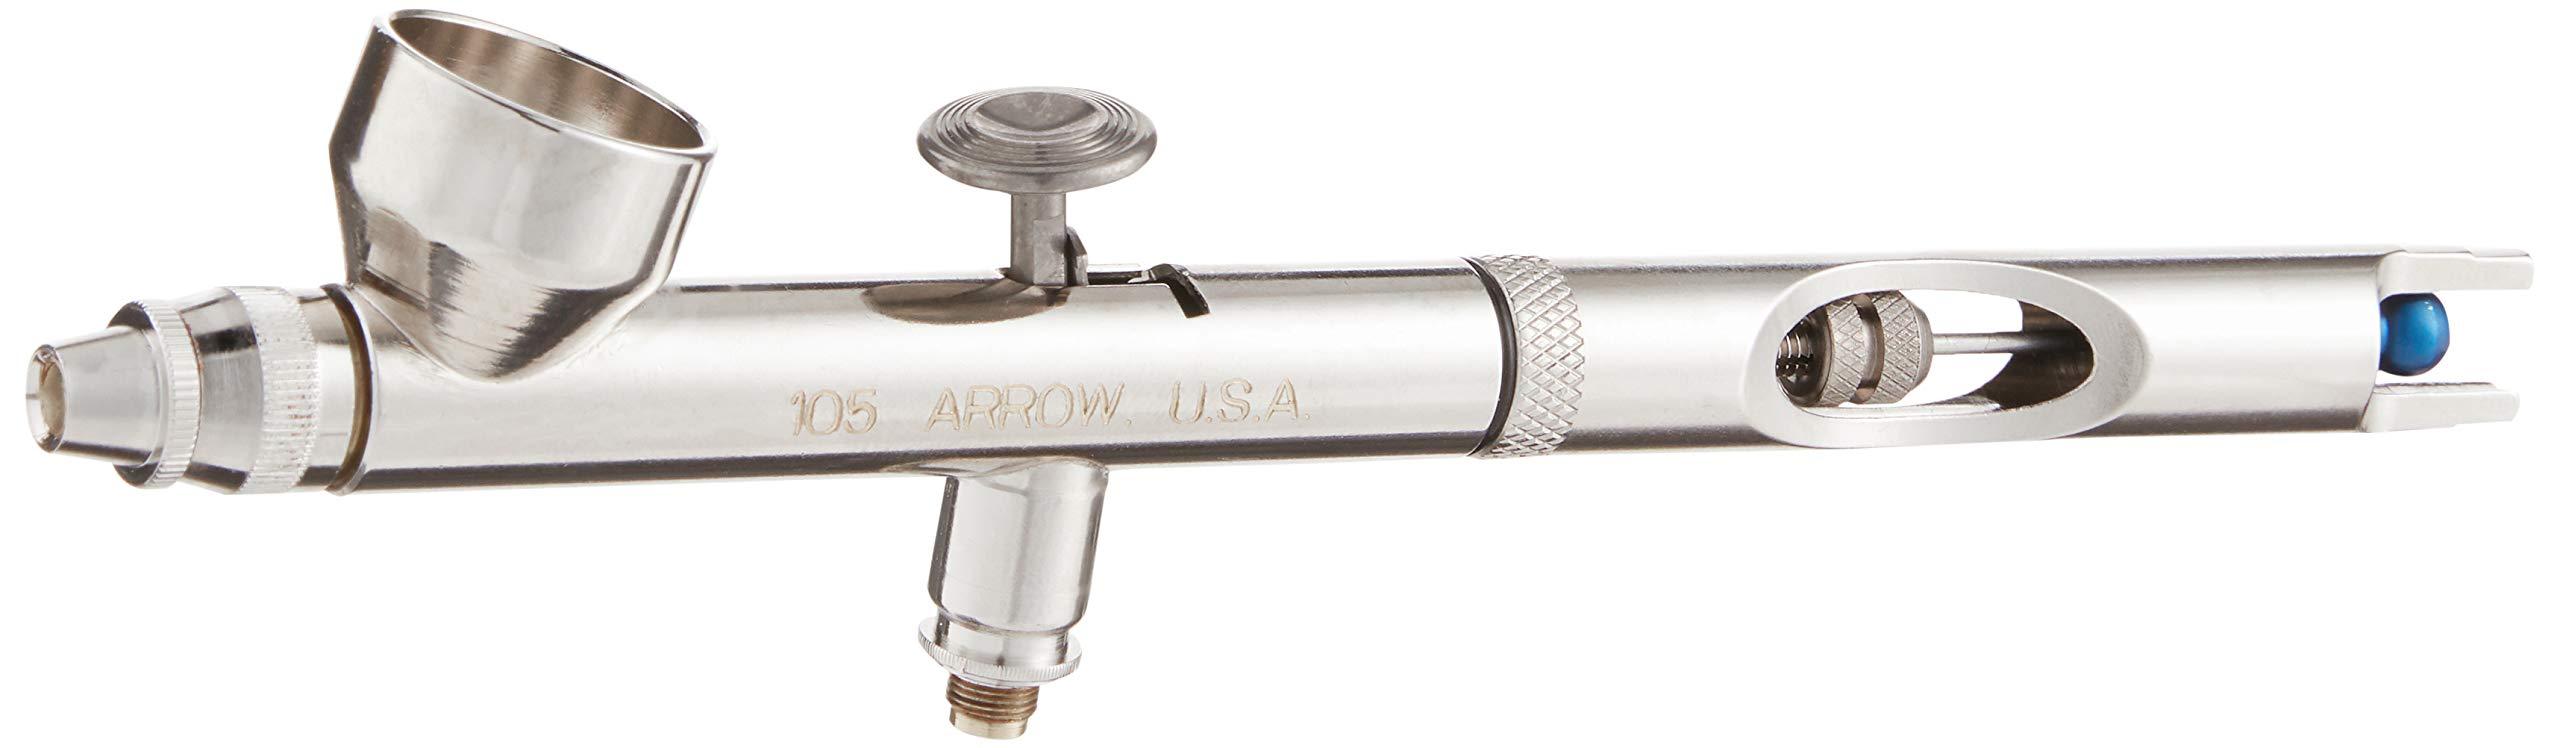 Badger Air-Brush Co. 105-2XR Airbrush